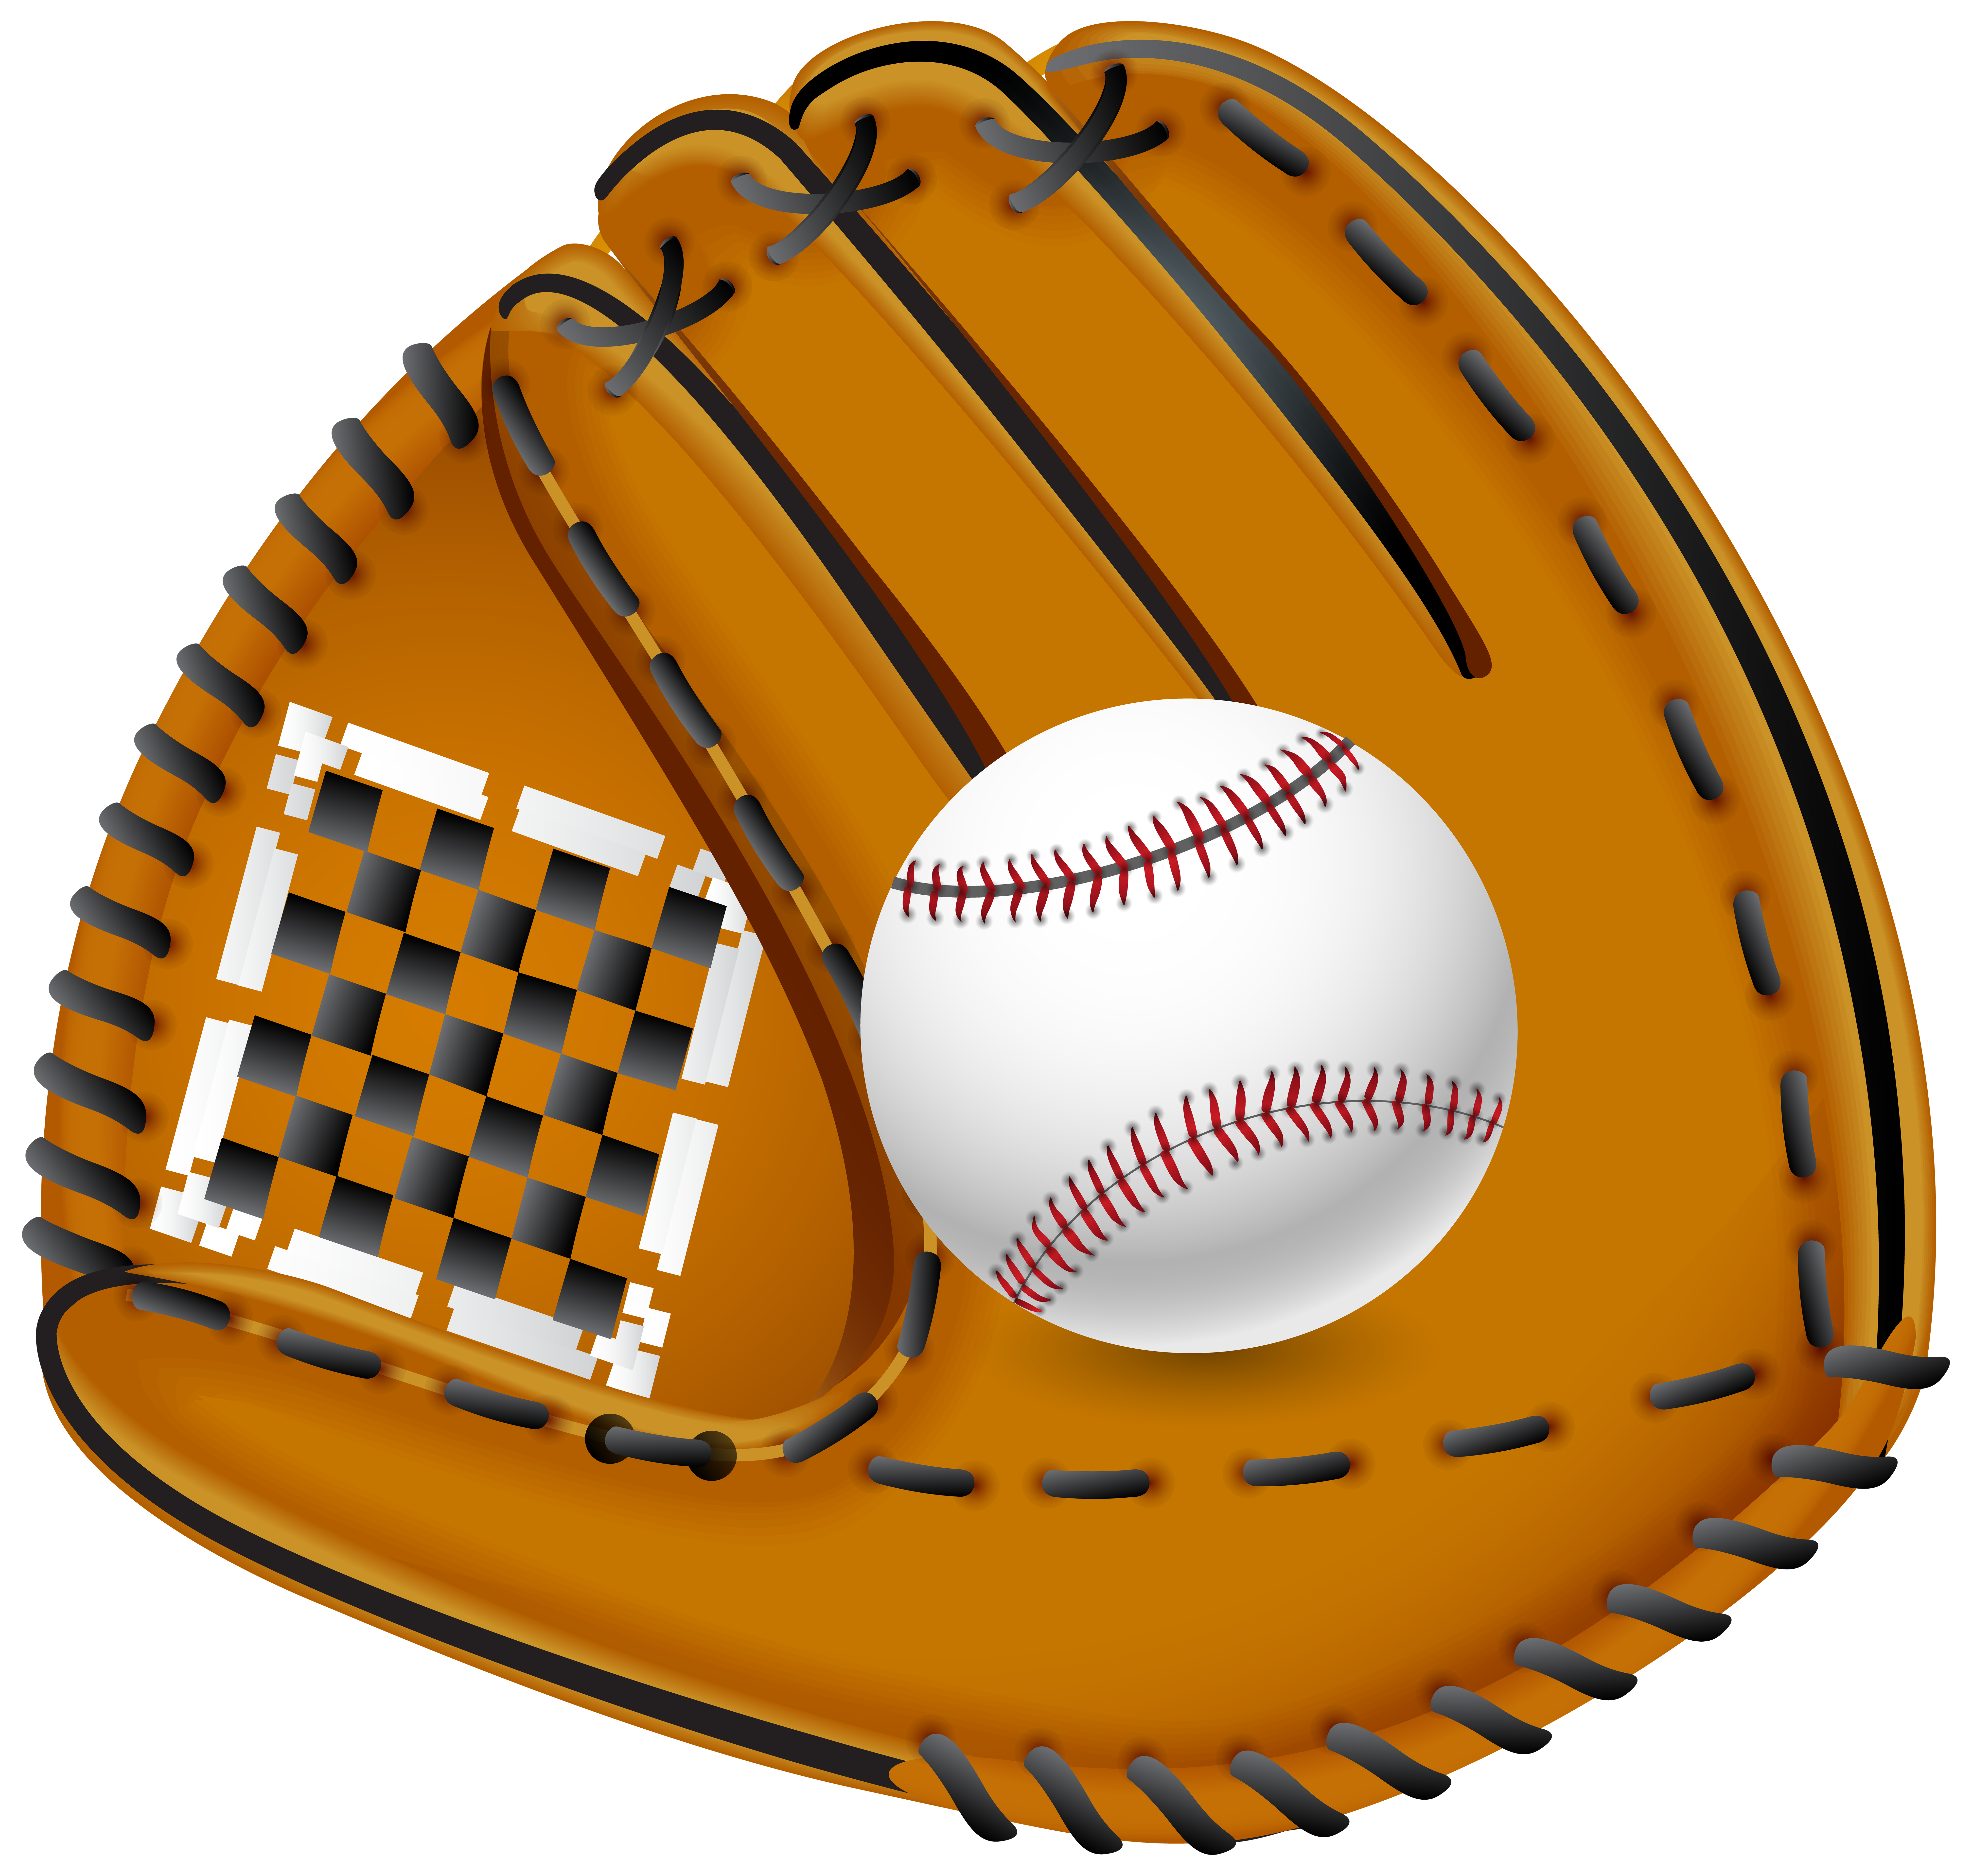 graphic black and white download Books clipart baseball. Glove transparent clip art